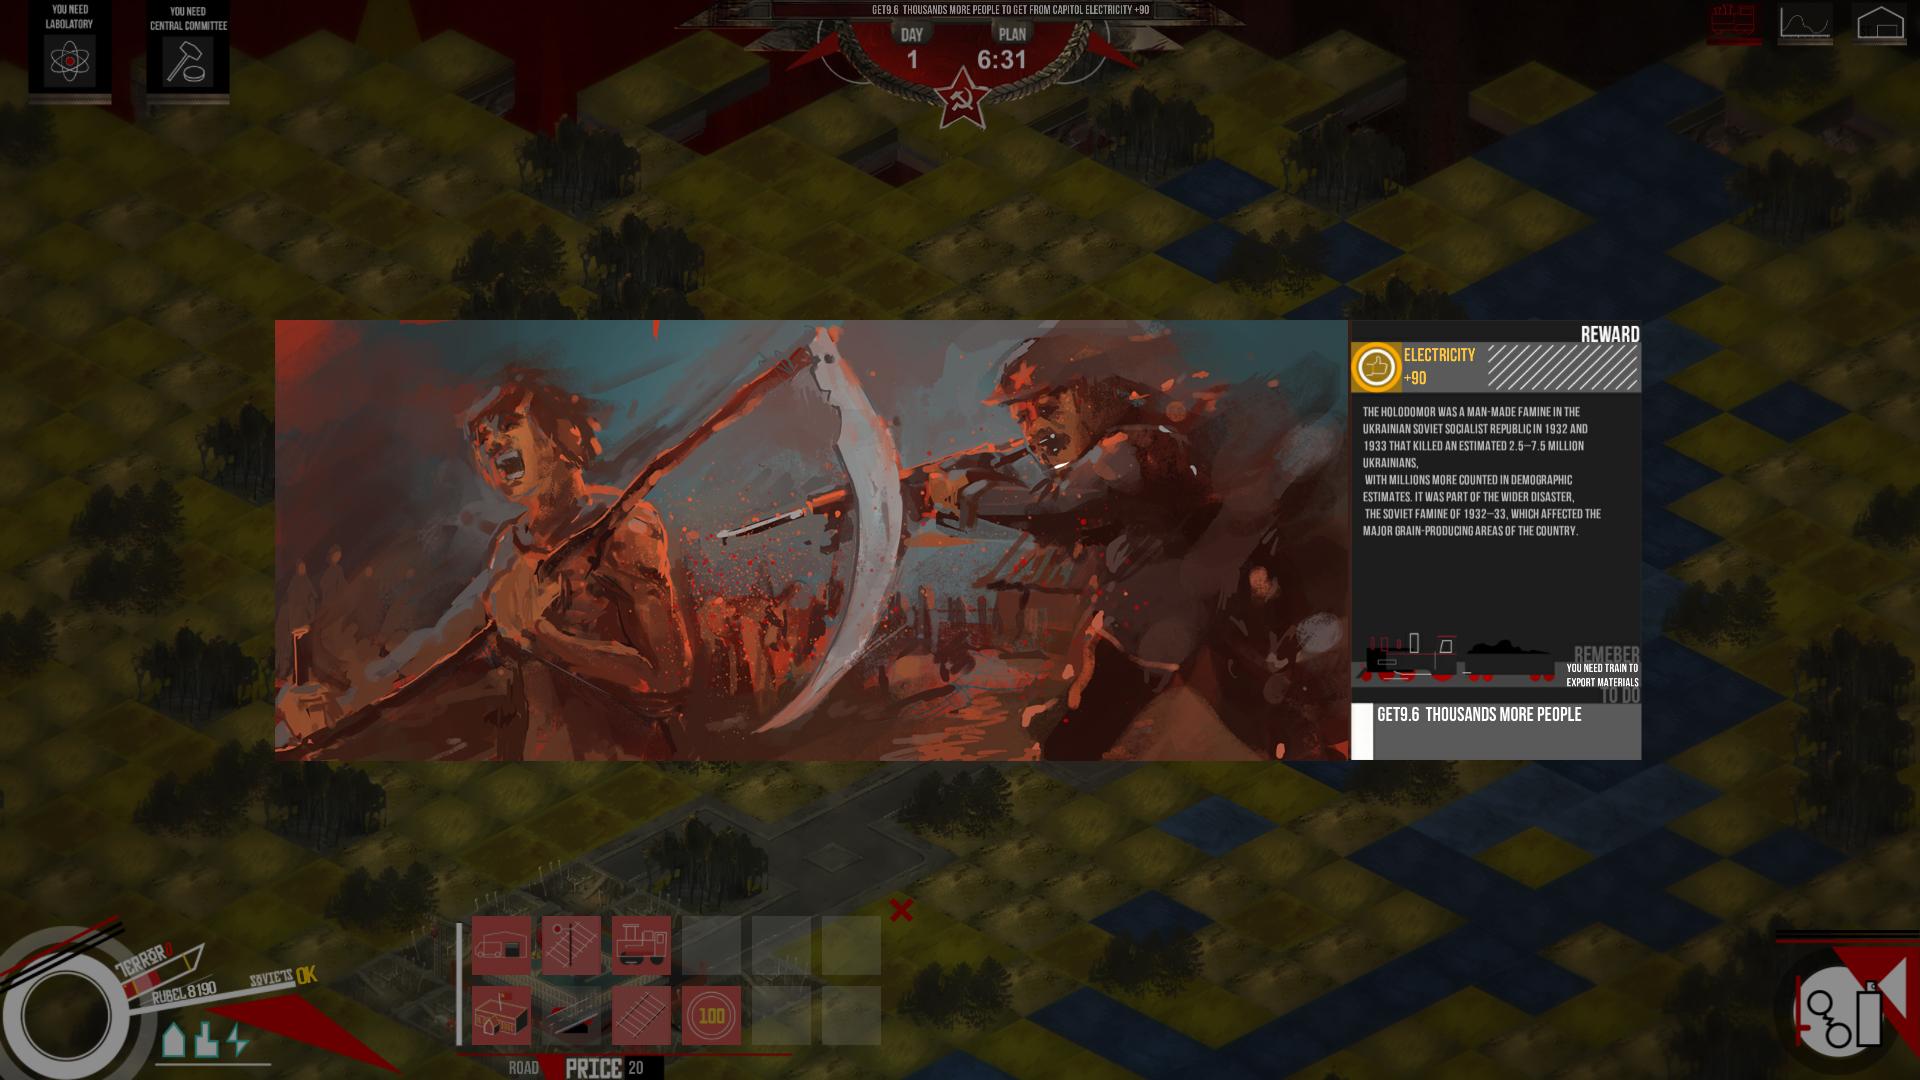 Photo of Comunistii vor ca acest joc sa fie interzis pe Steam